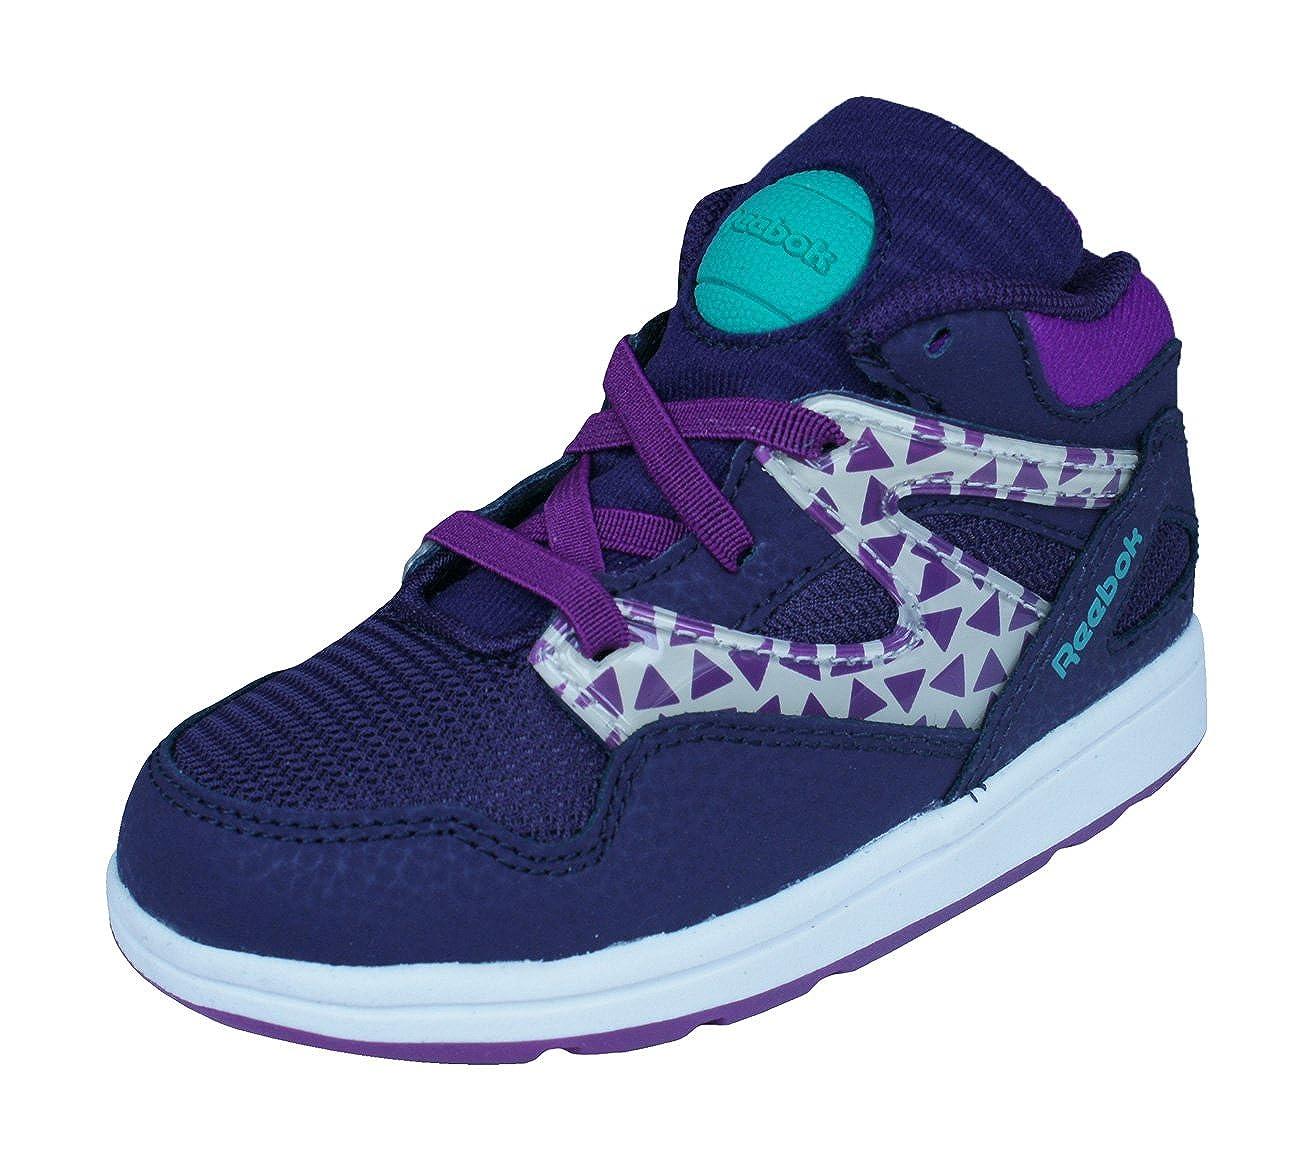 Reebok VERSA PUMP OMNI LITE Basket mode bebe fille violet